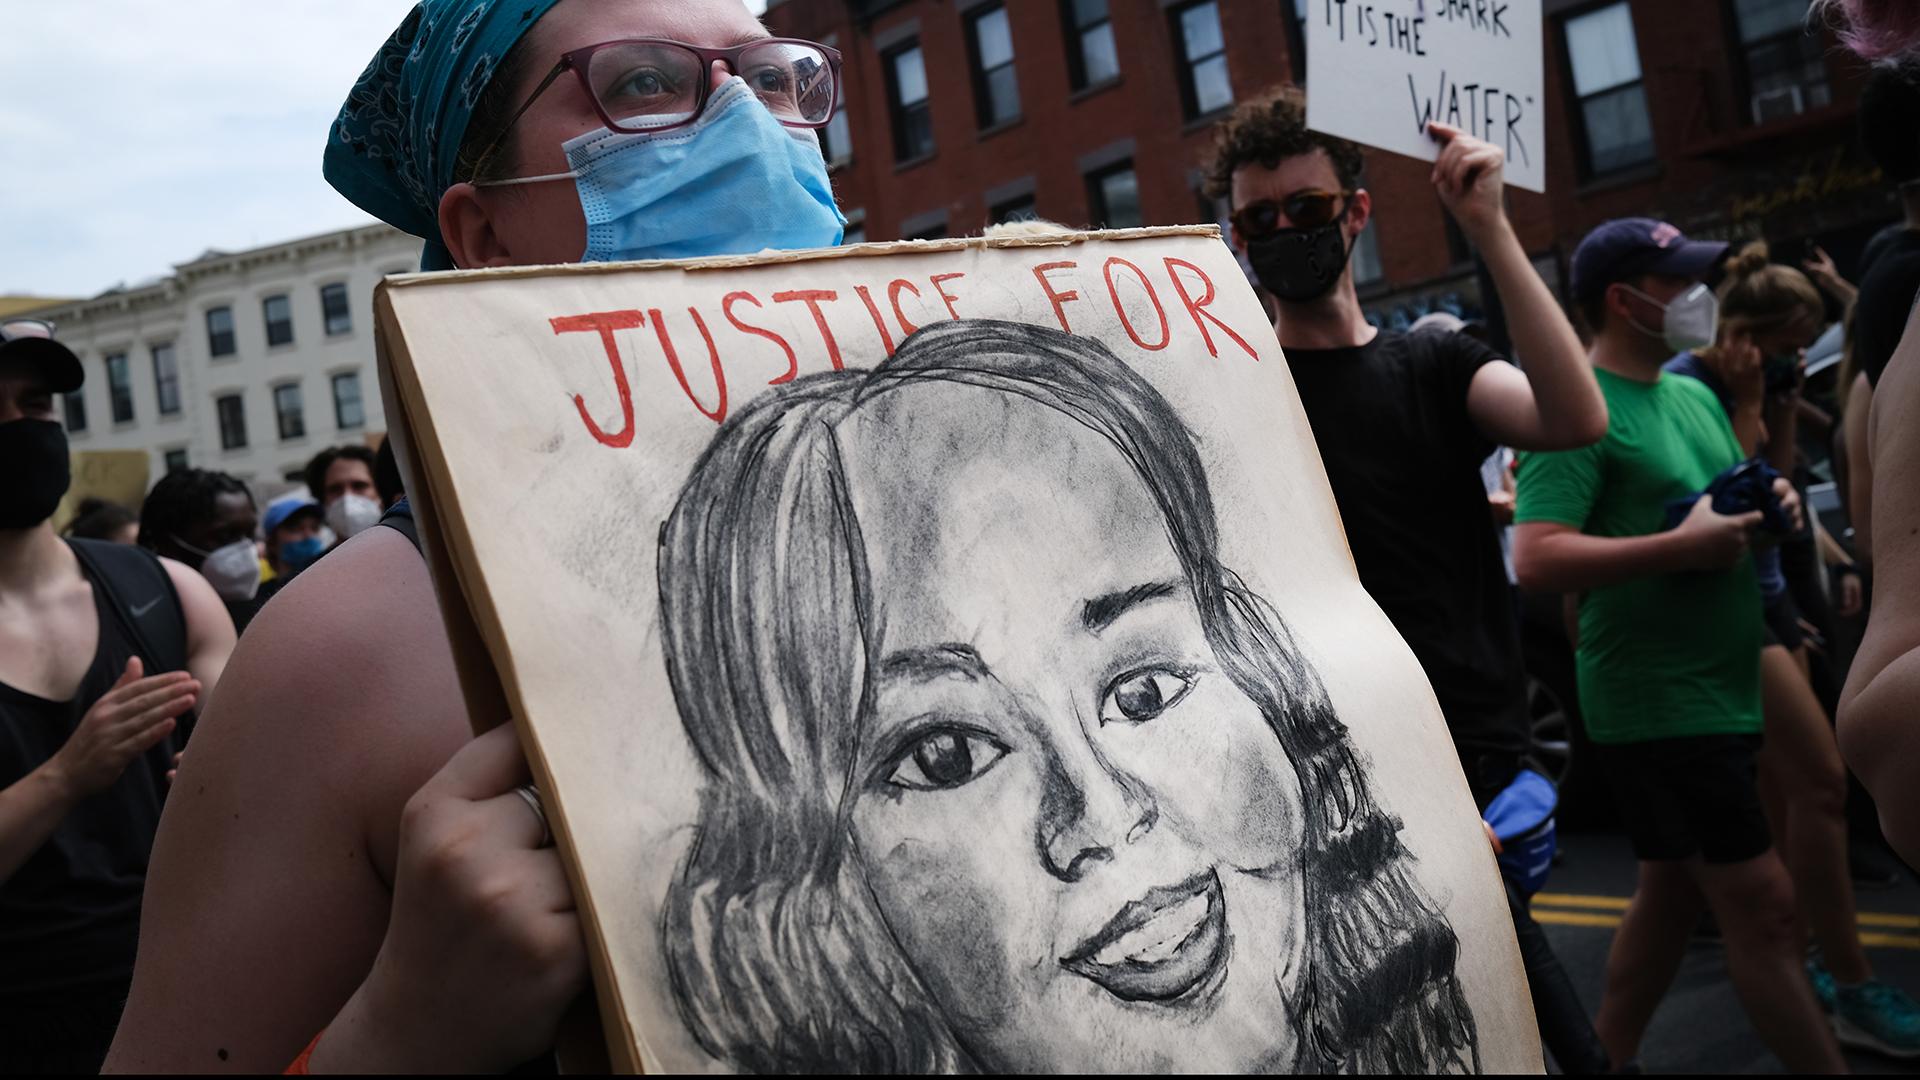 Breonna Taylorért is tüntet a Black Lives Matter mozgalom